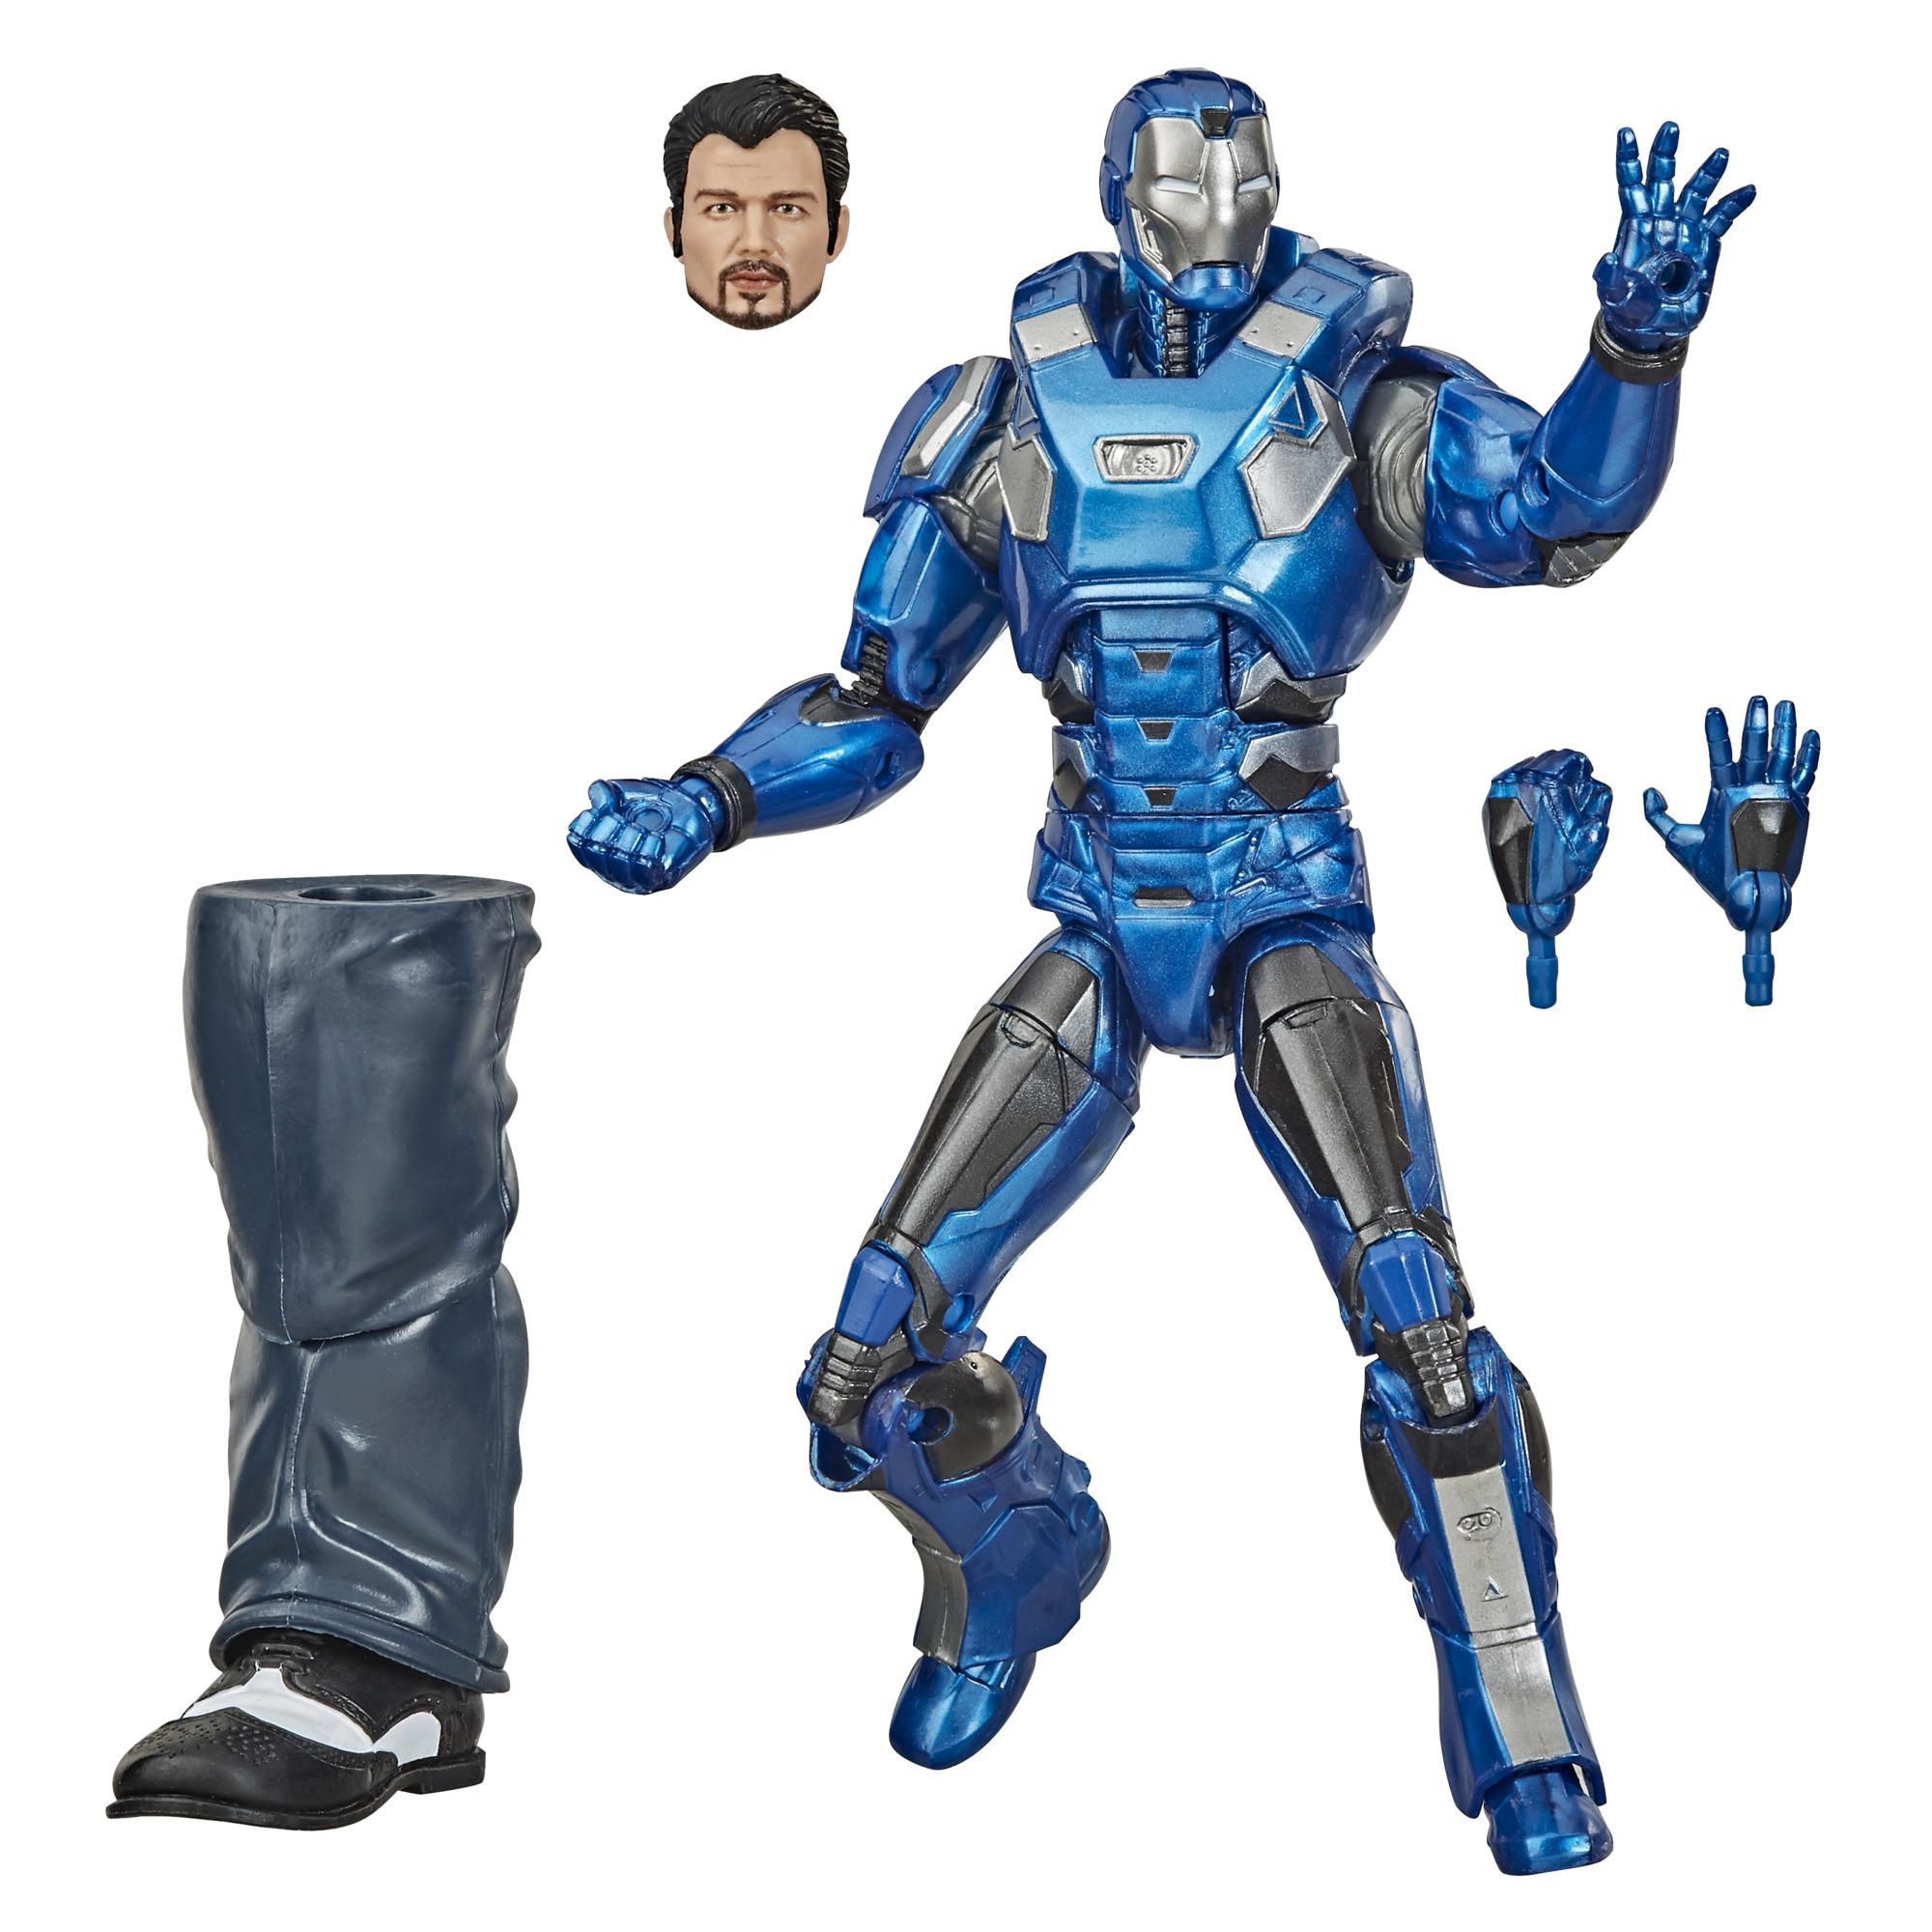 Marvel Legends - Marvels Avengers Gameverse - Atmosphere Iron Man Action Figure (Joe Fixit BAF)